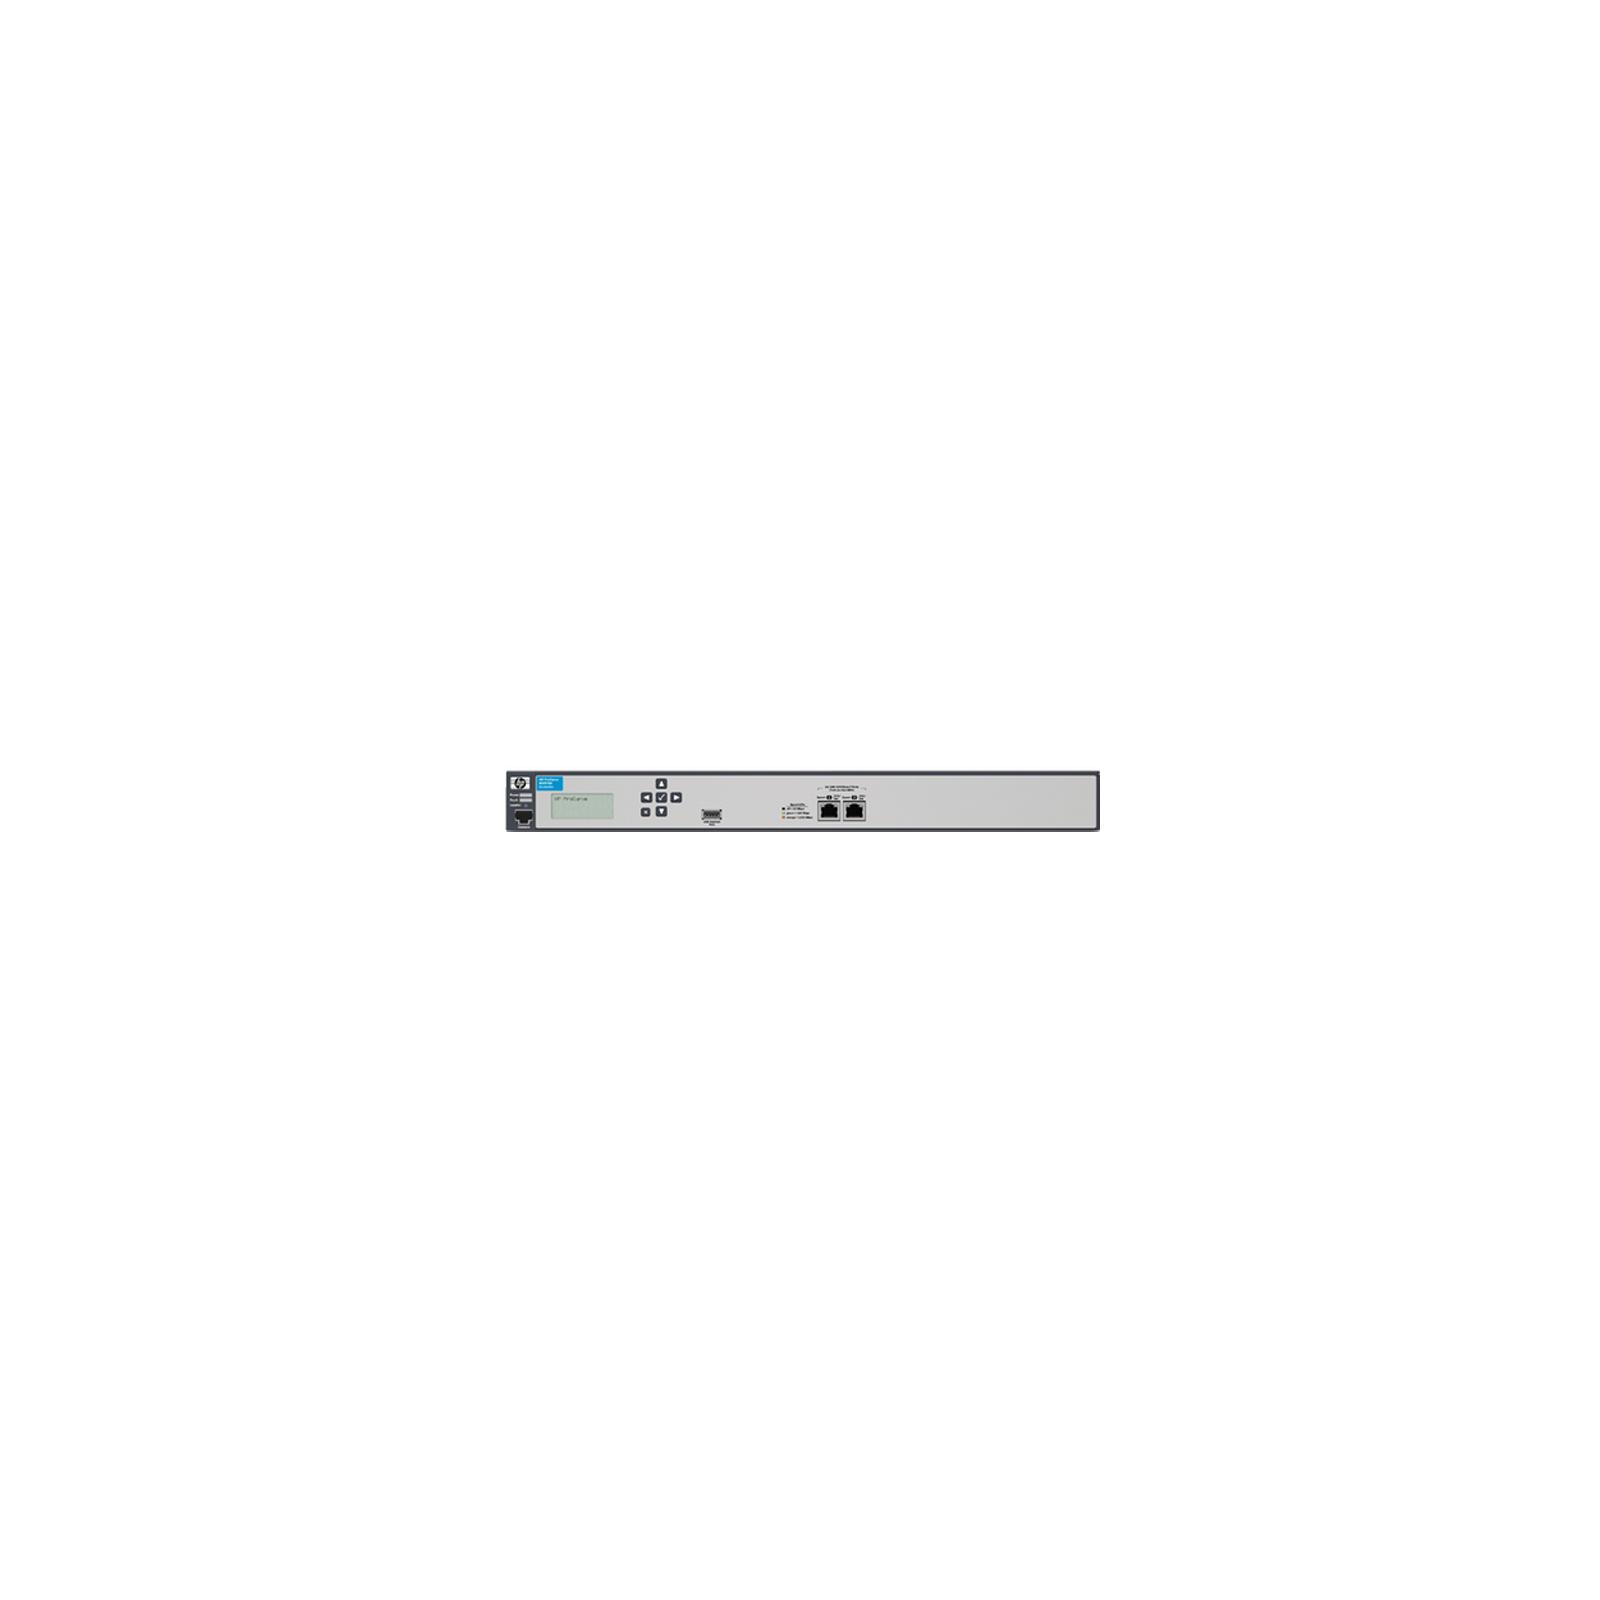 Контроллер доступа HP J9421A изображение 2